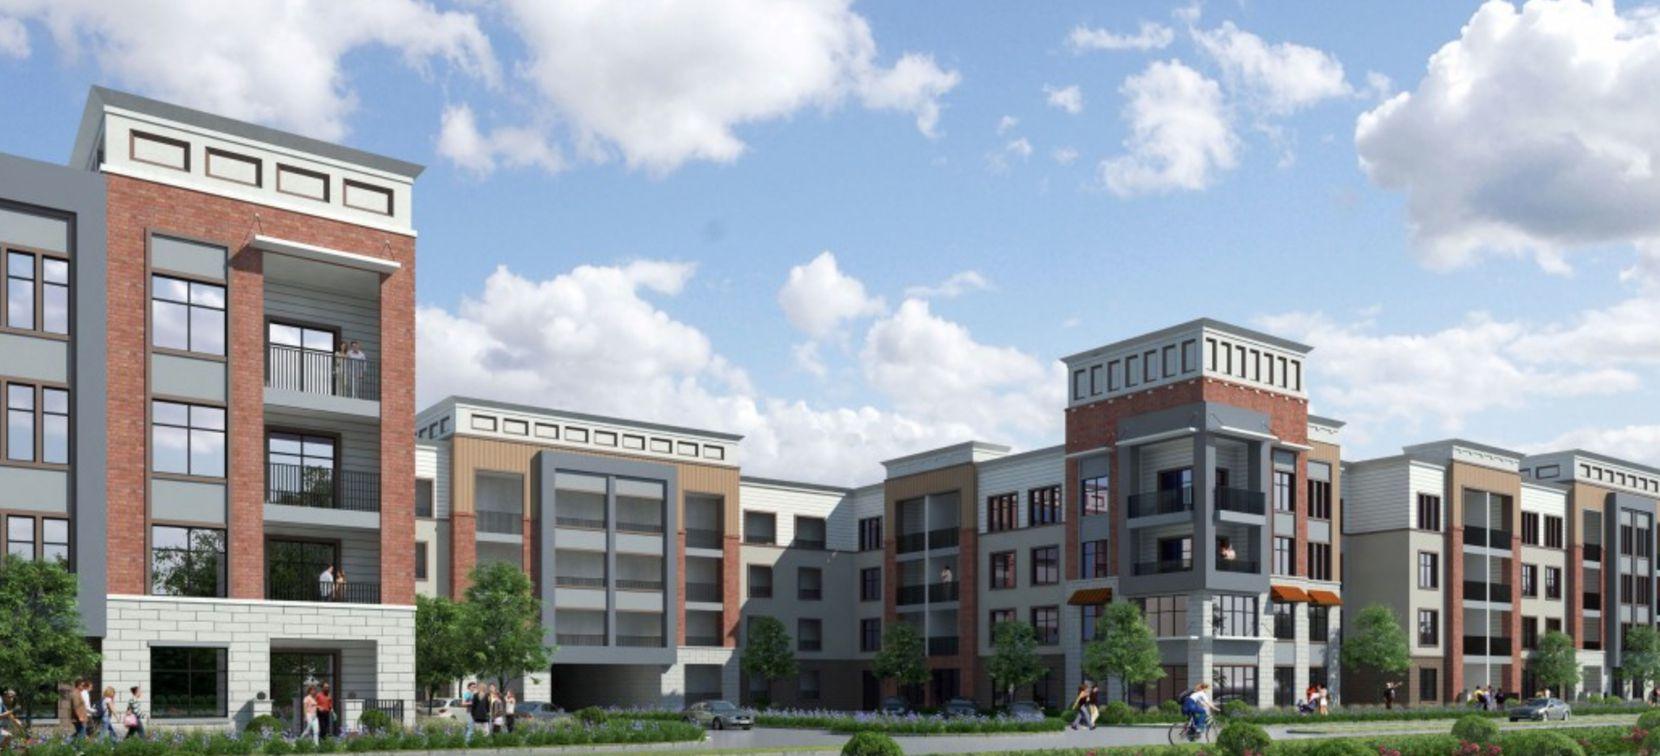 Palladium USA's new rental community in the Redbird Mall redevelopment will open early next year.